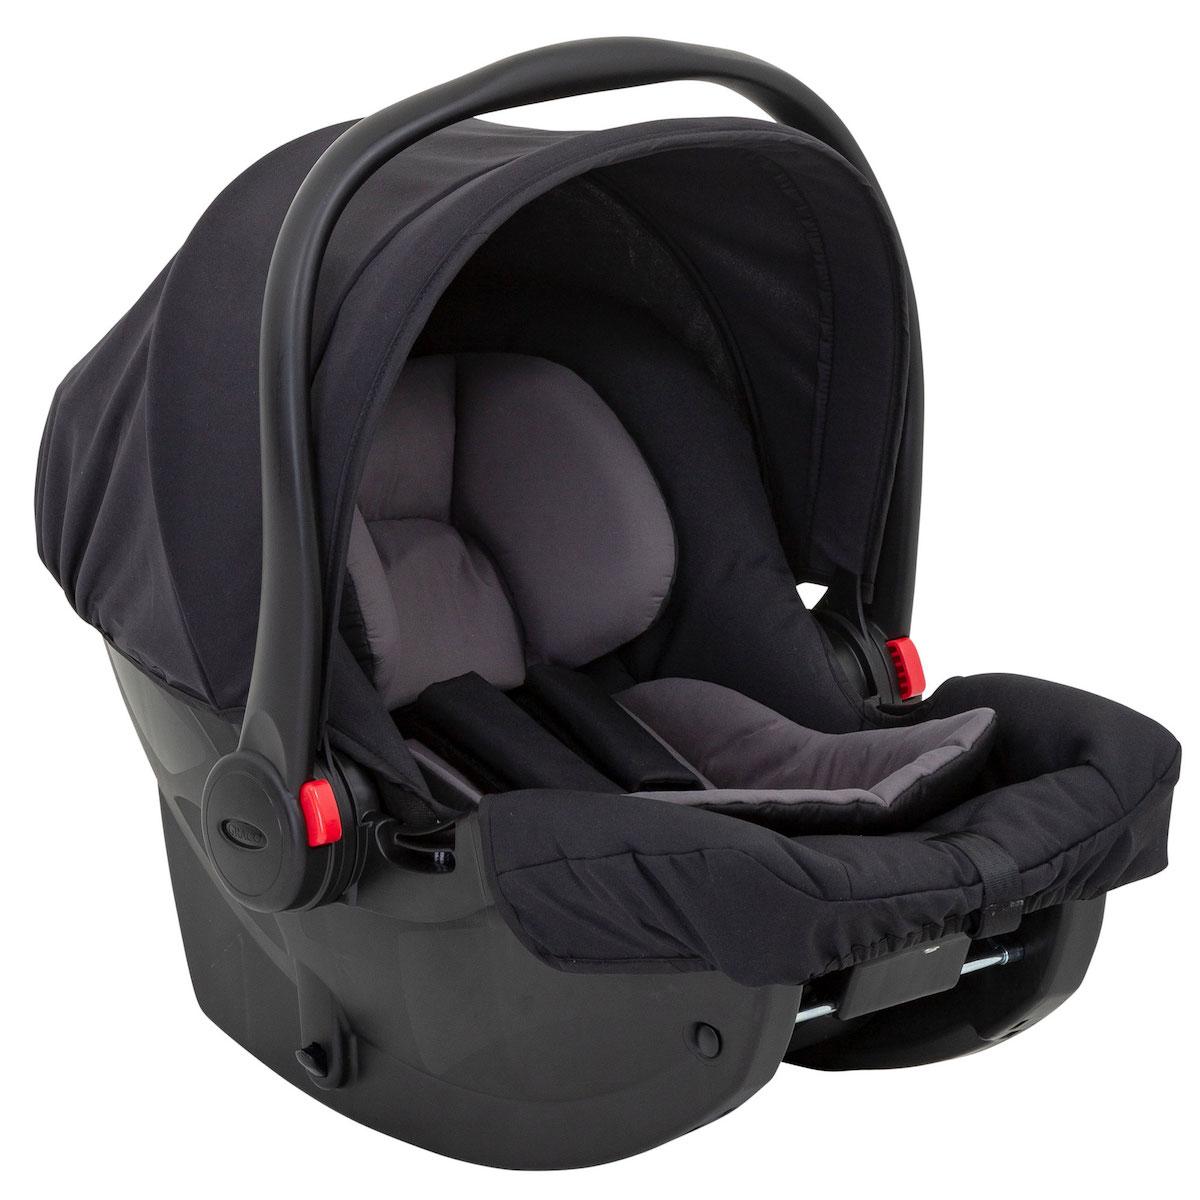 Graco SnugEssentials i-Size Babyschale